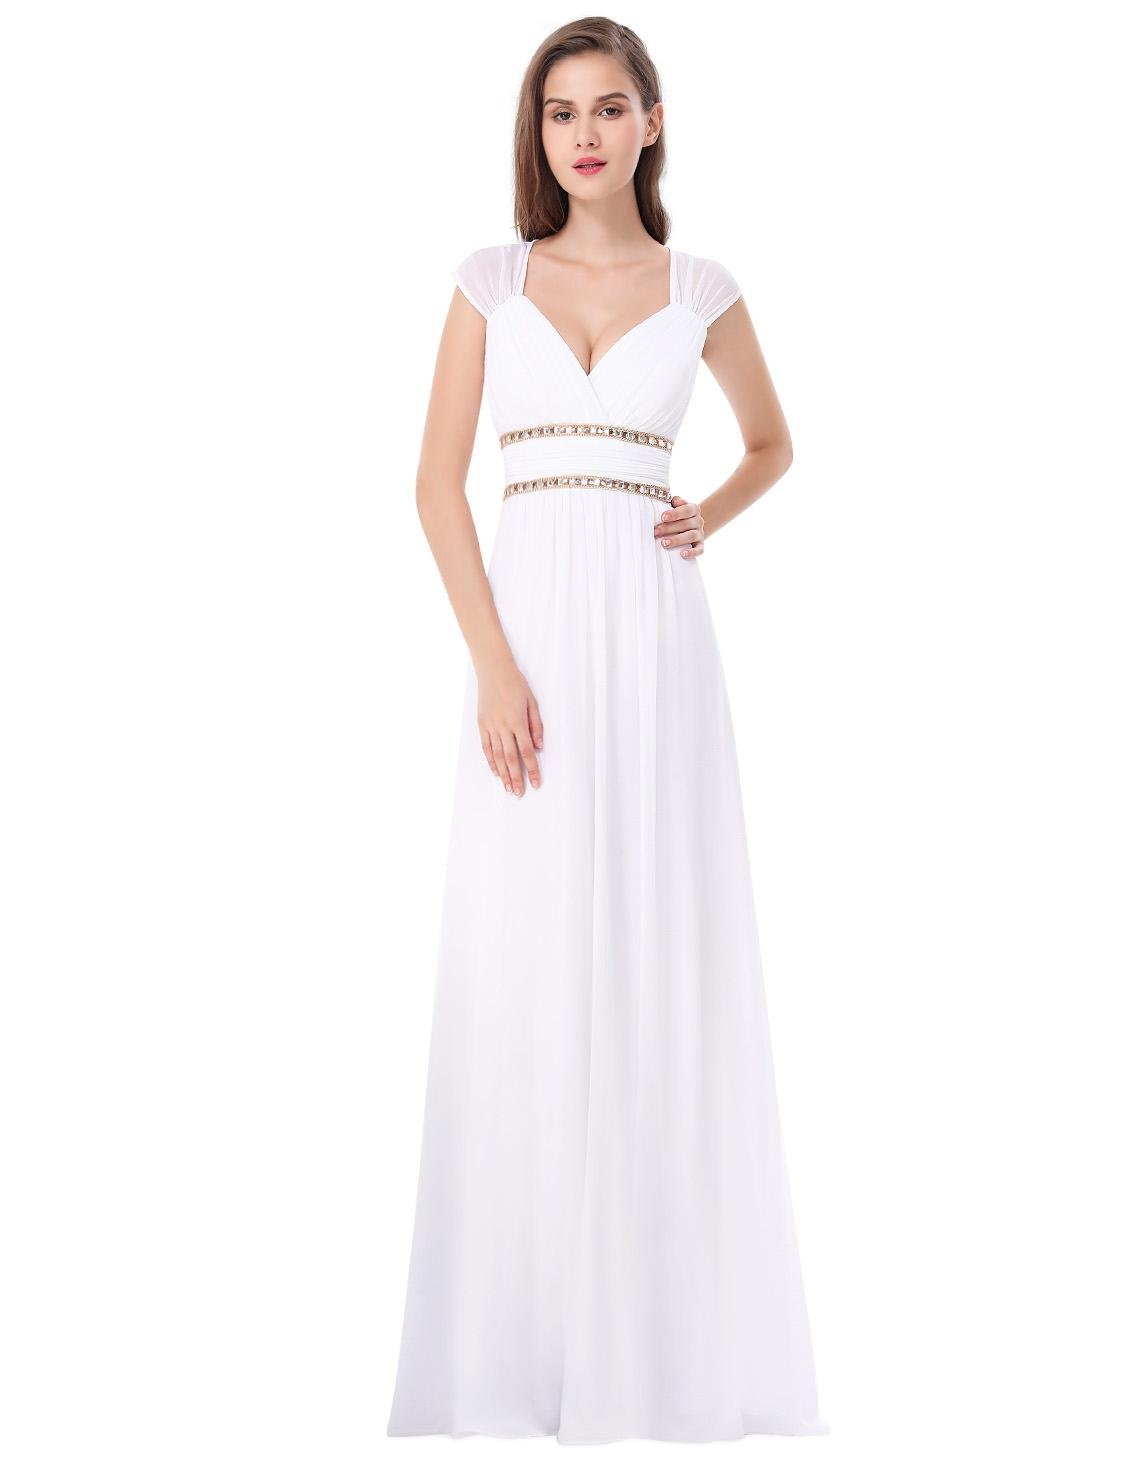 c69d2810189e Ever-Pretty Bílé šaty inspirované antikou ze šifonu - Glami.cz